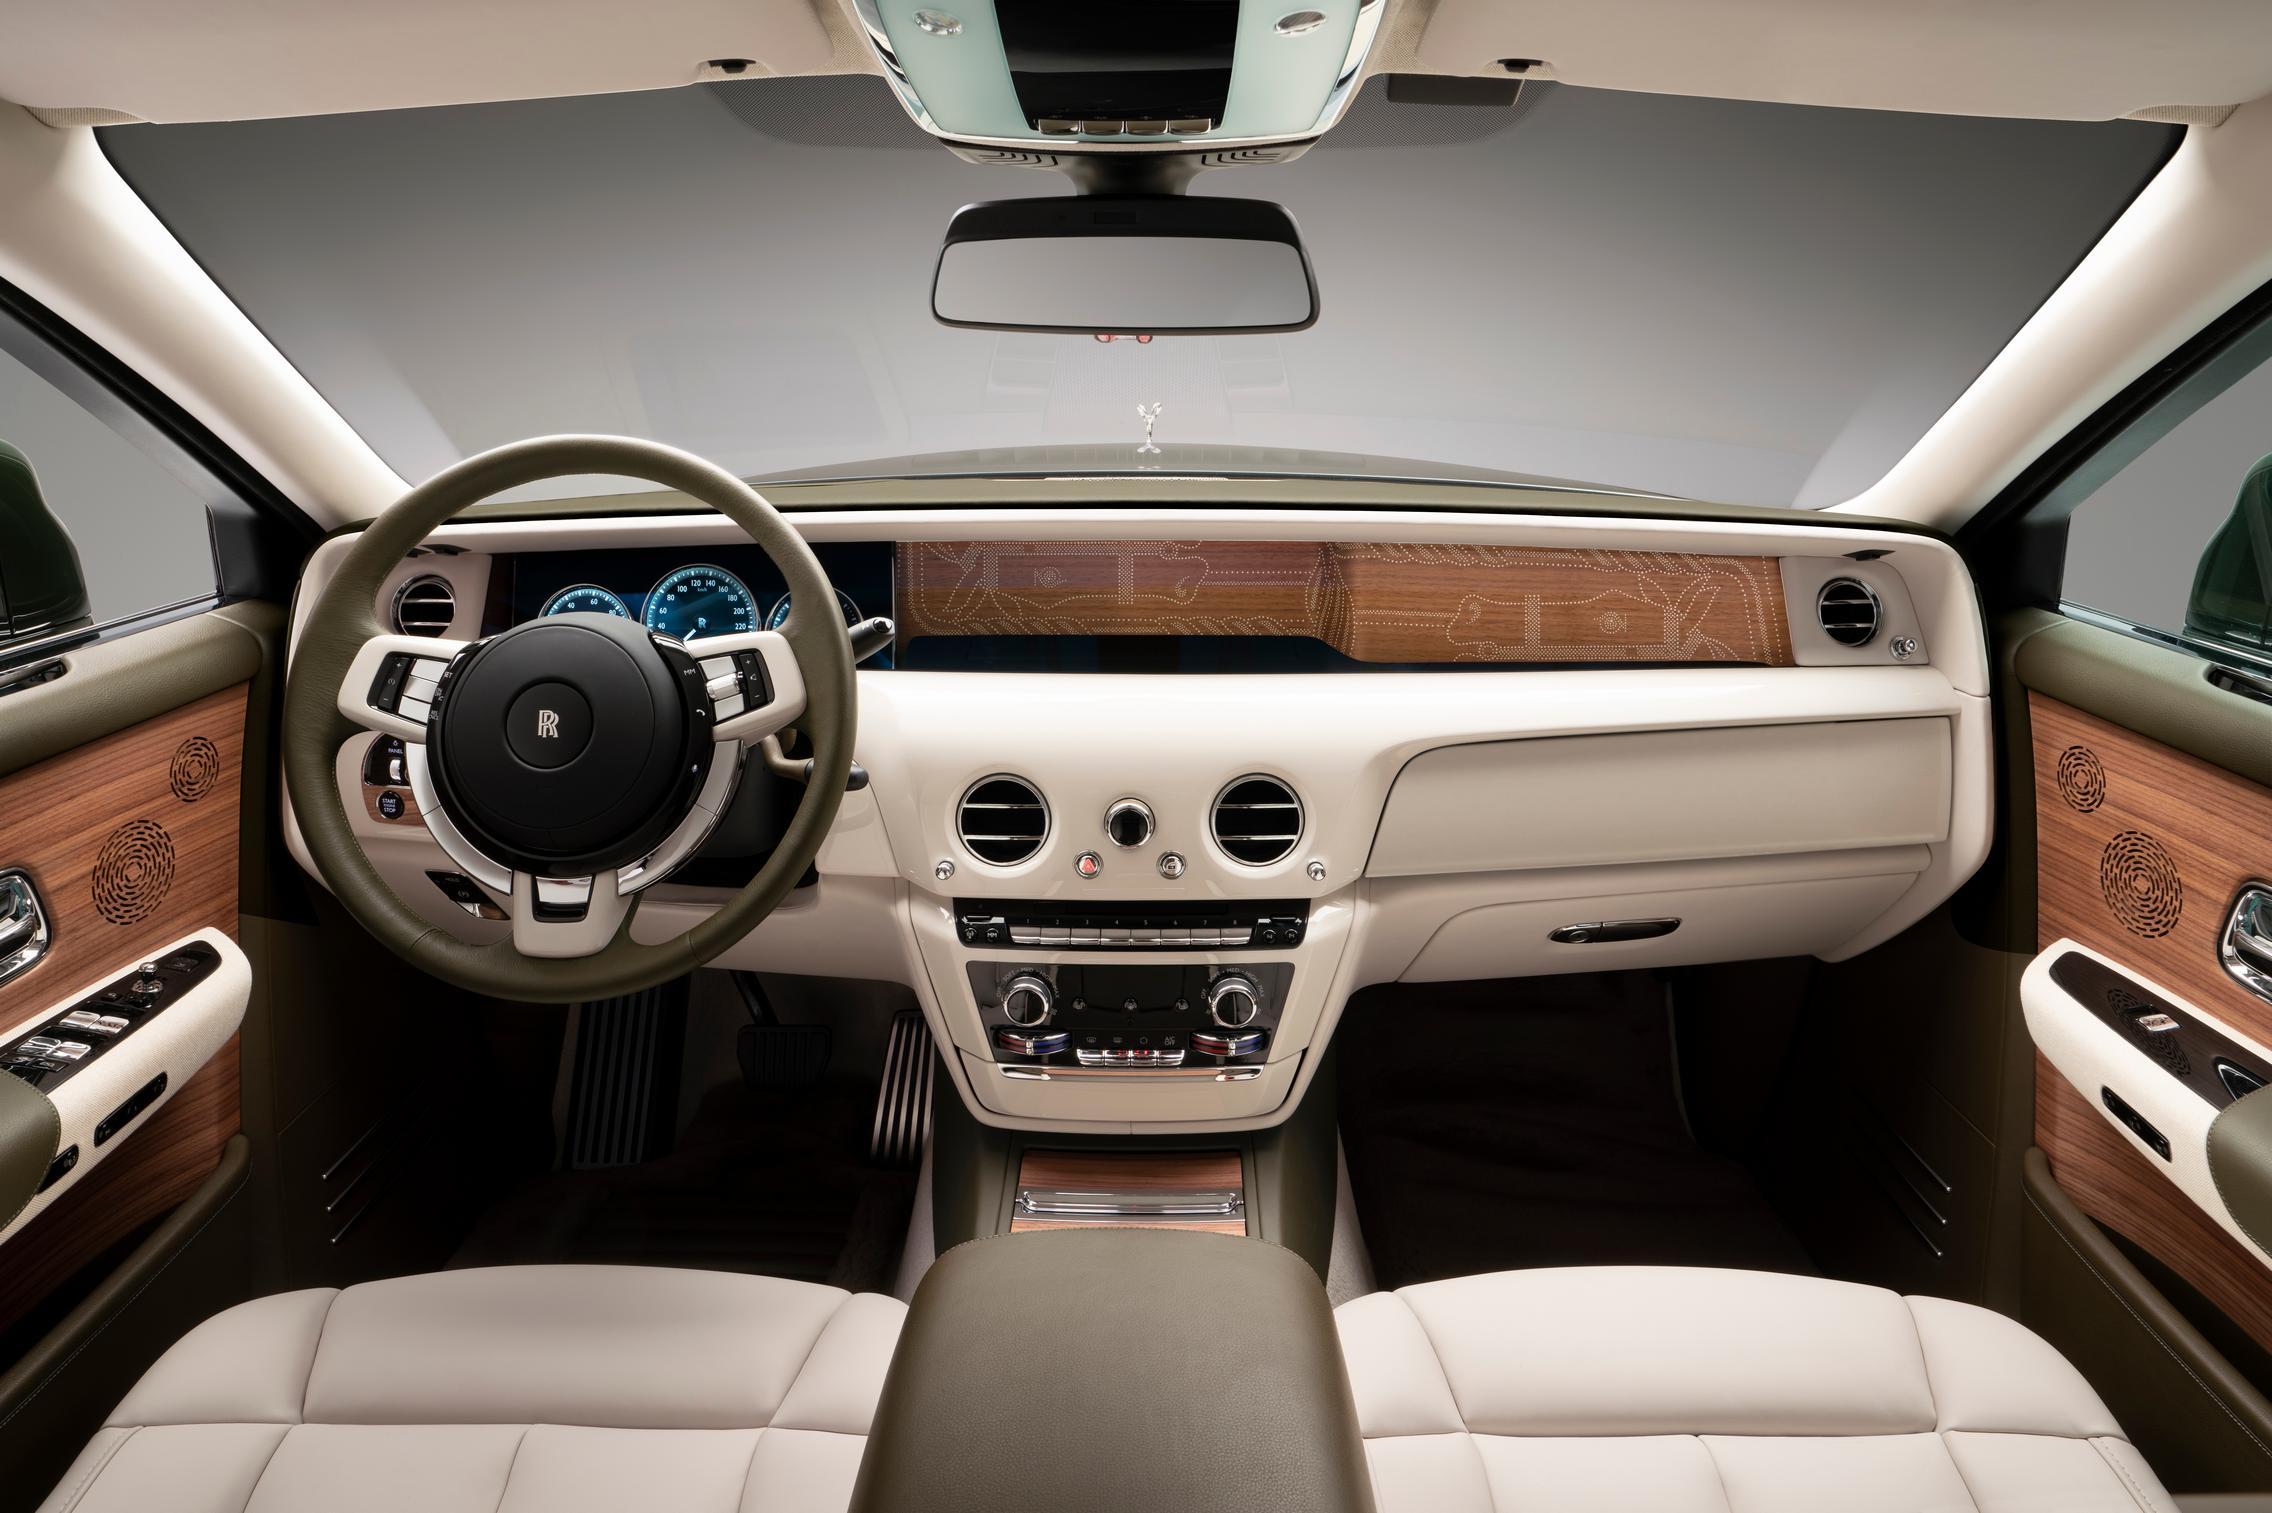 Hermes Rolls-Royce Phantom interior